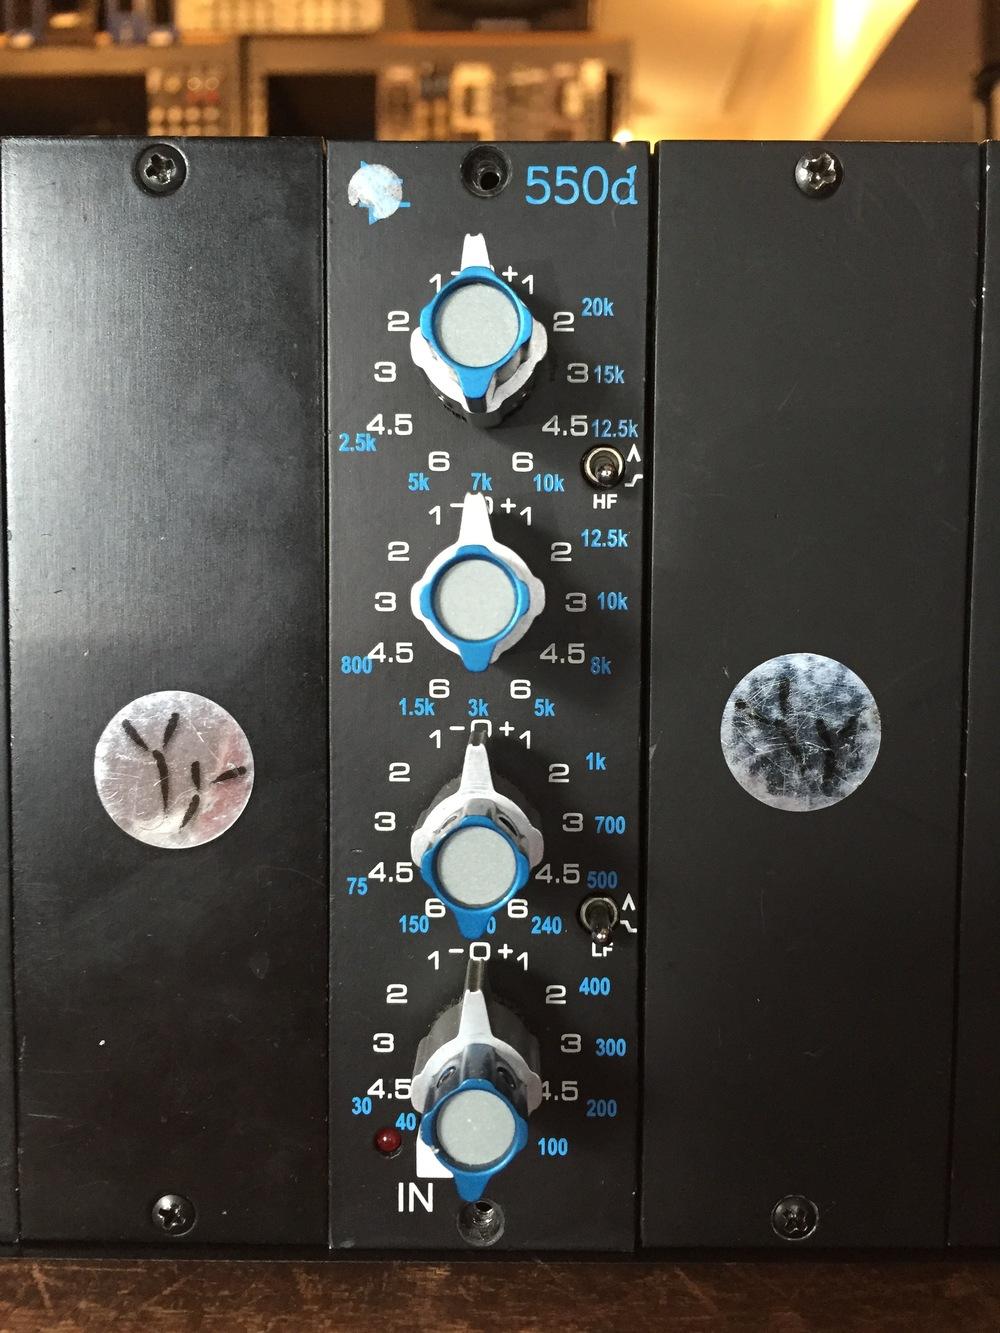 API 550d